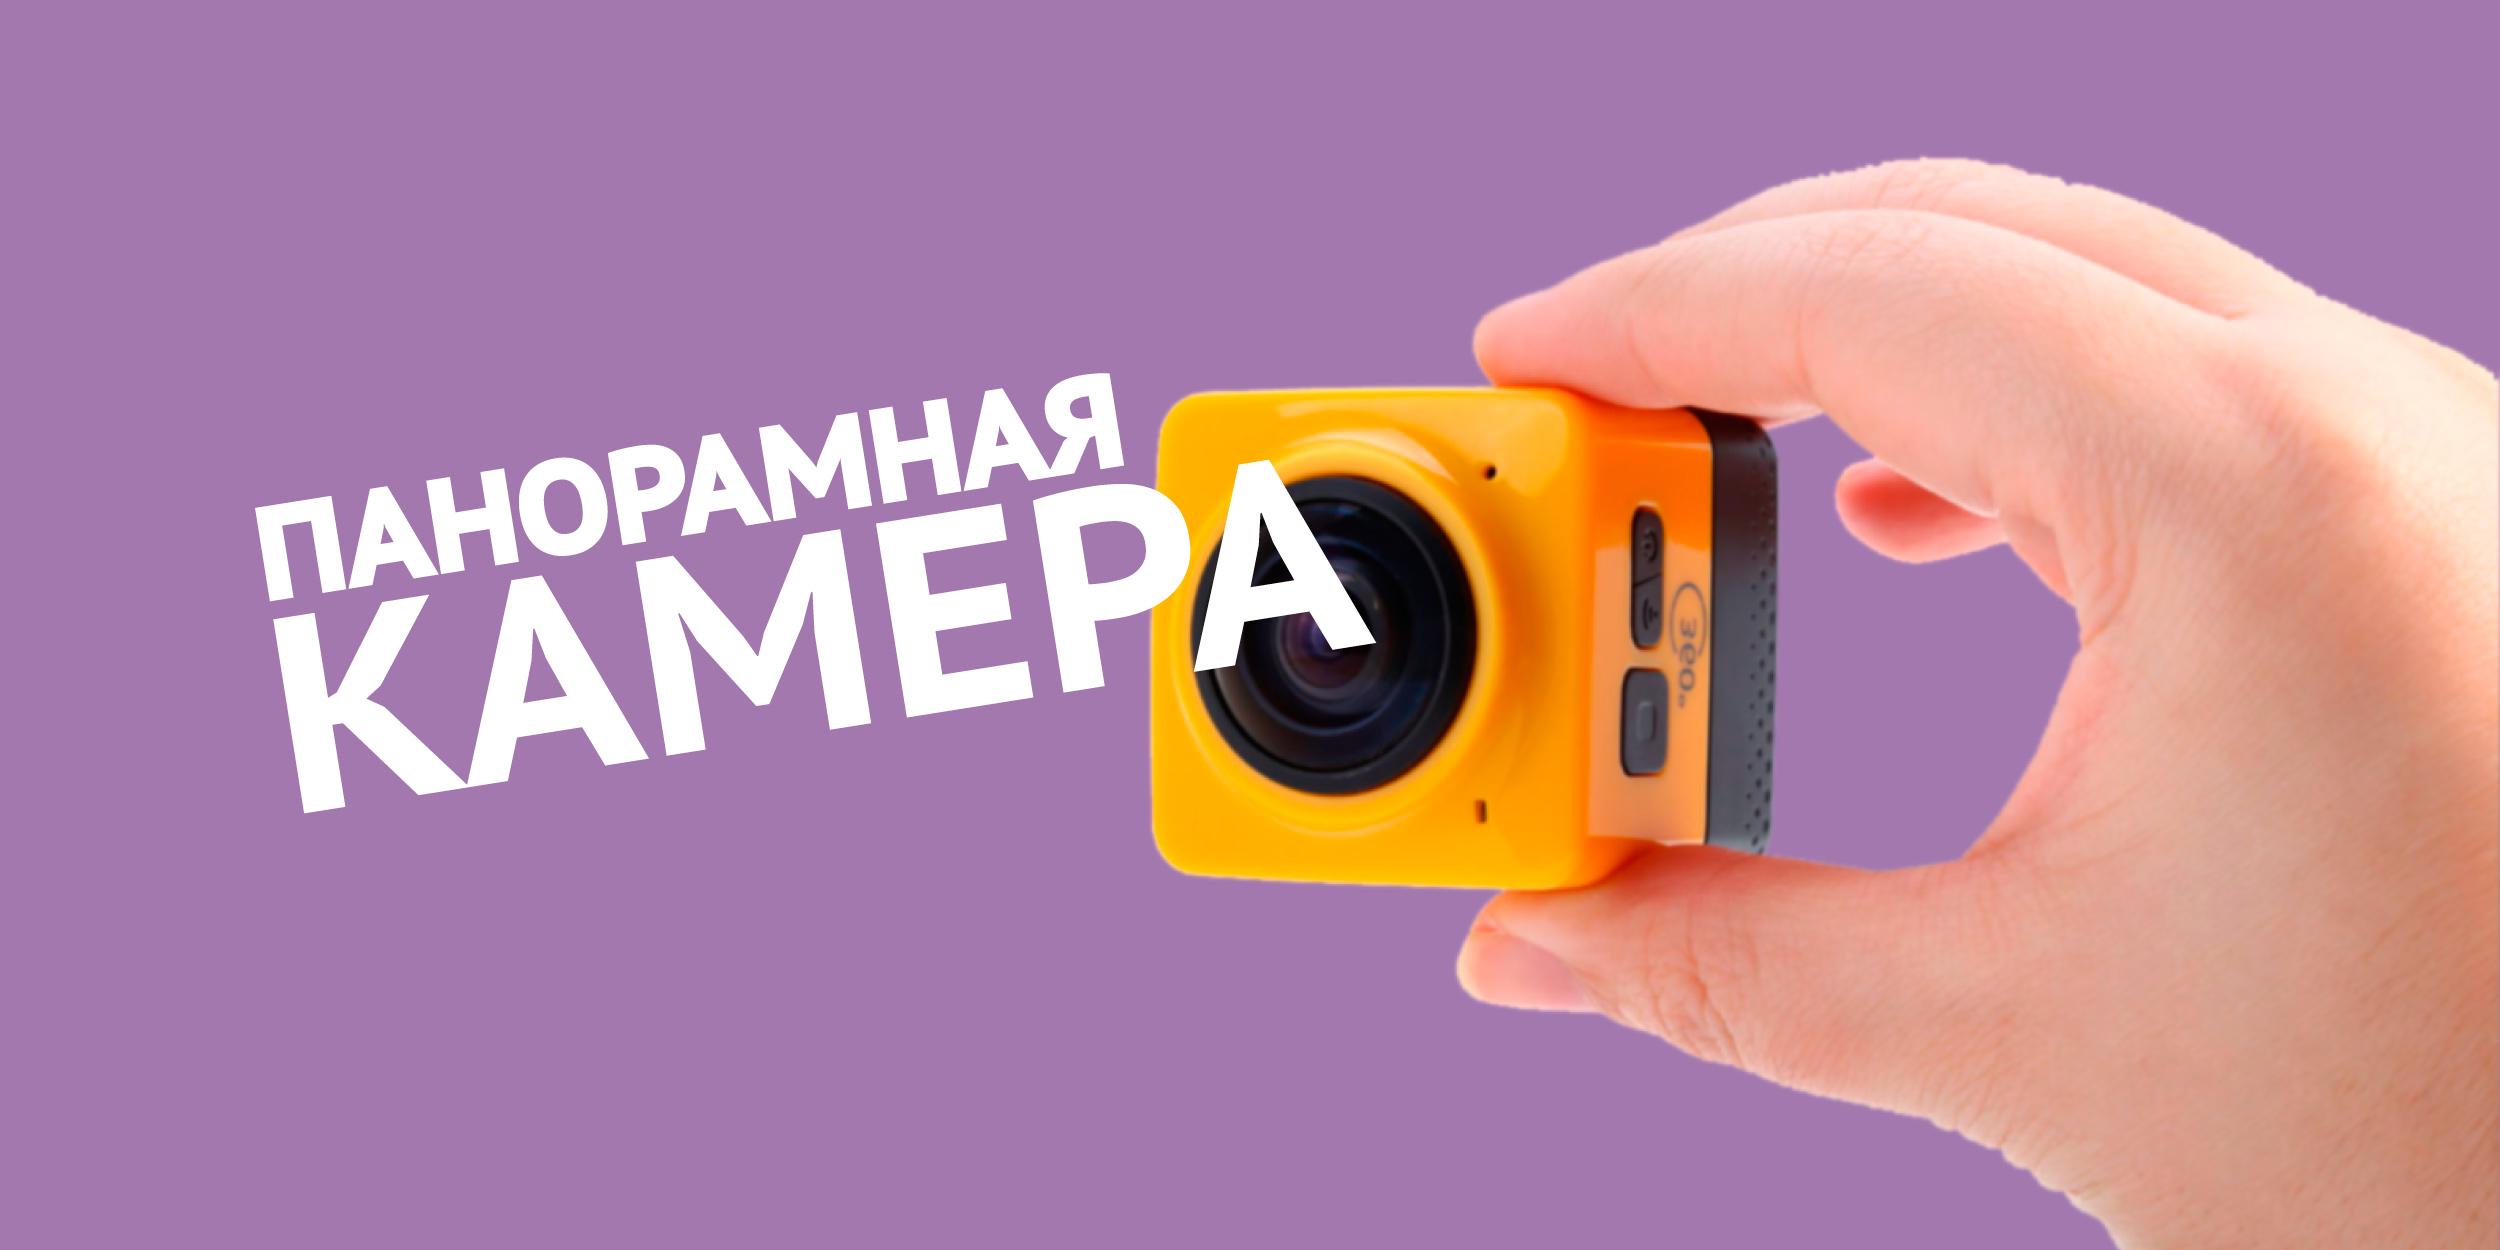 Обзор Cube 360: доступная камера для создания VR-панорам